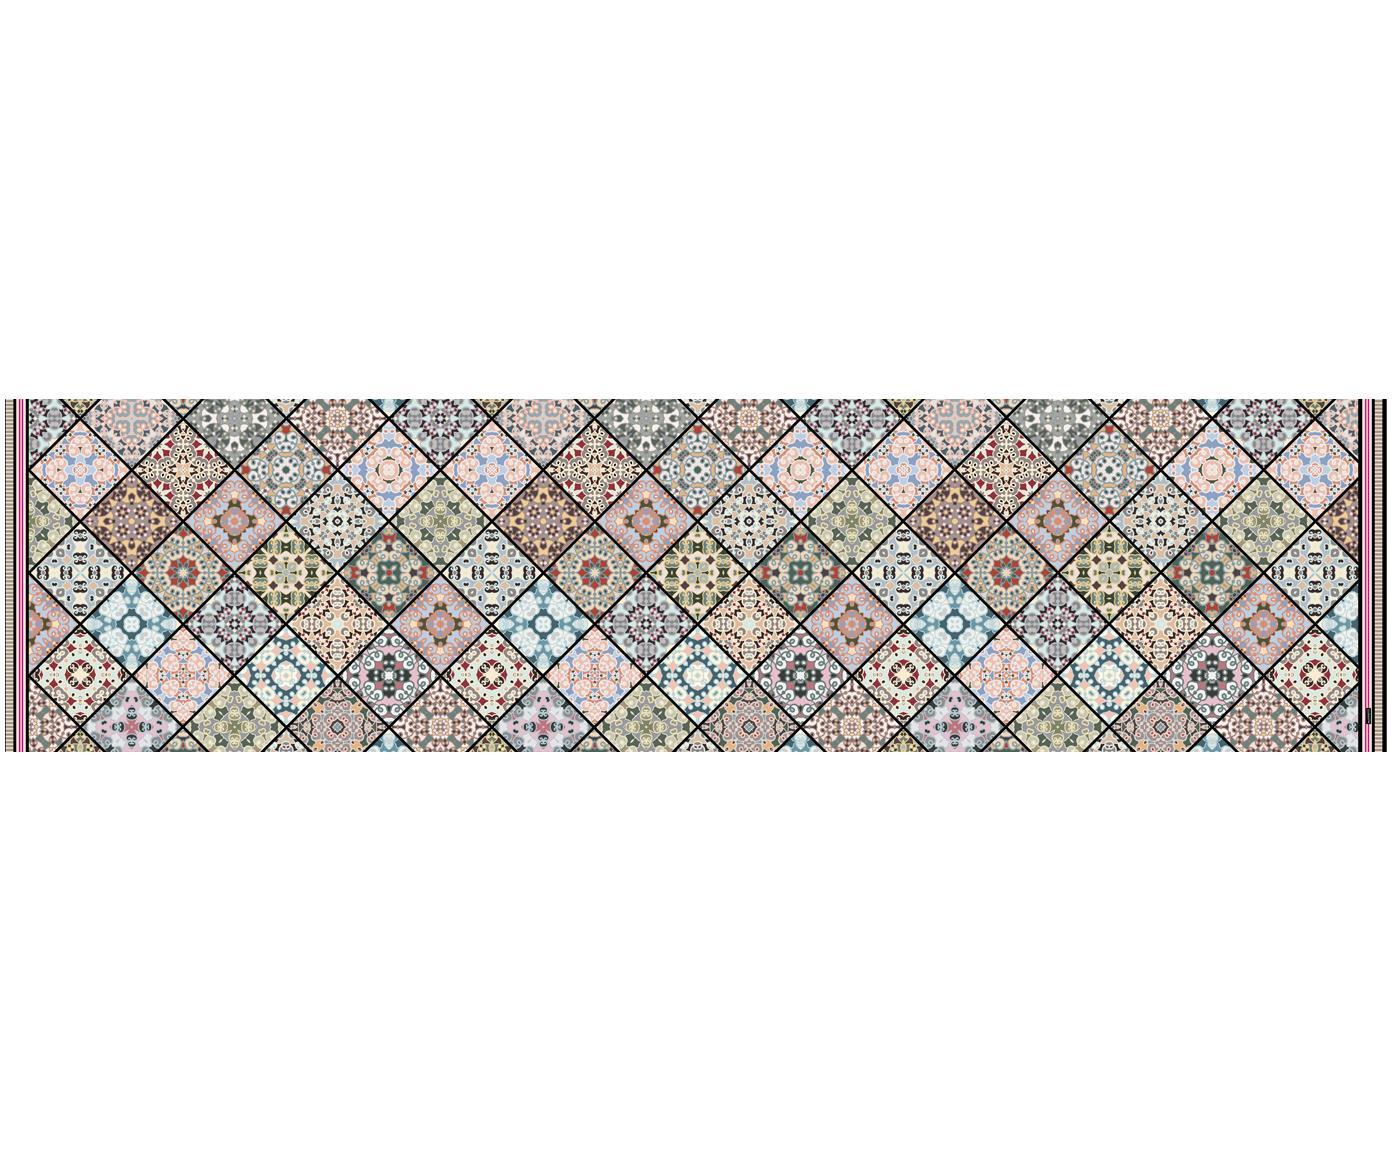 Vinyl-Bodenmatte Aylin, Vinyl, recycelbar, Mehrfarbig, 65 x 255 cm